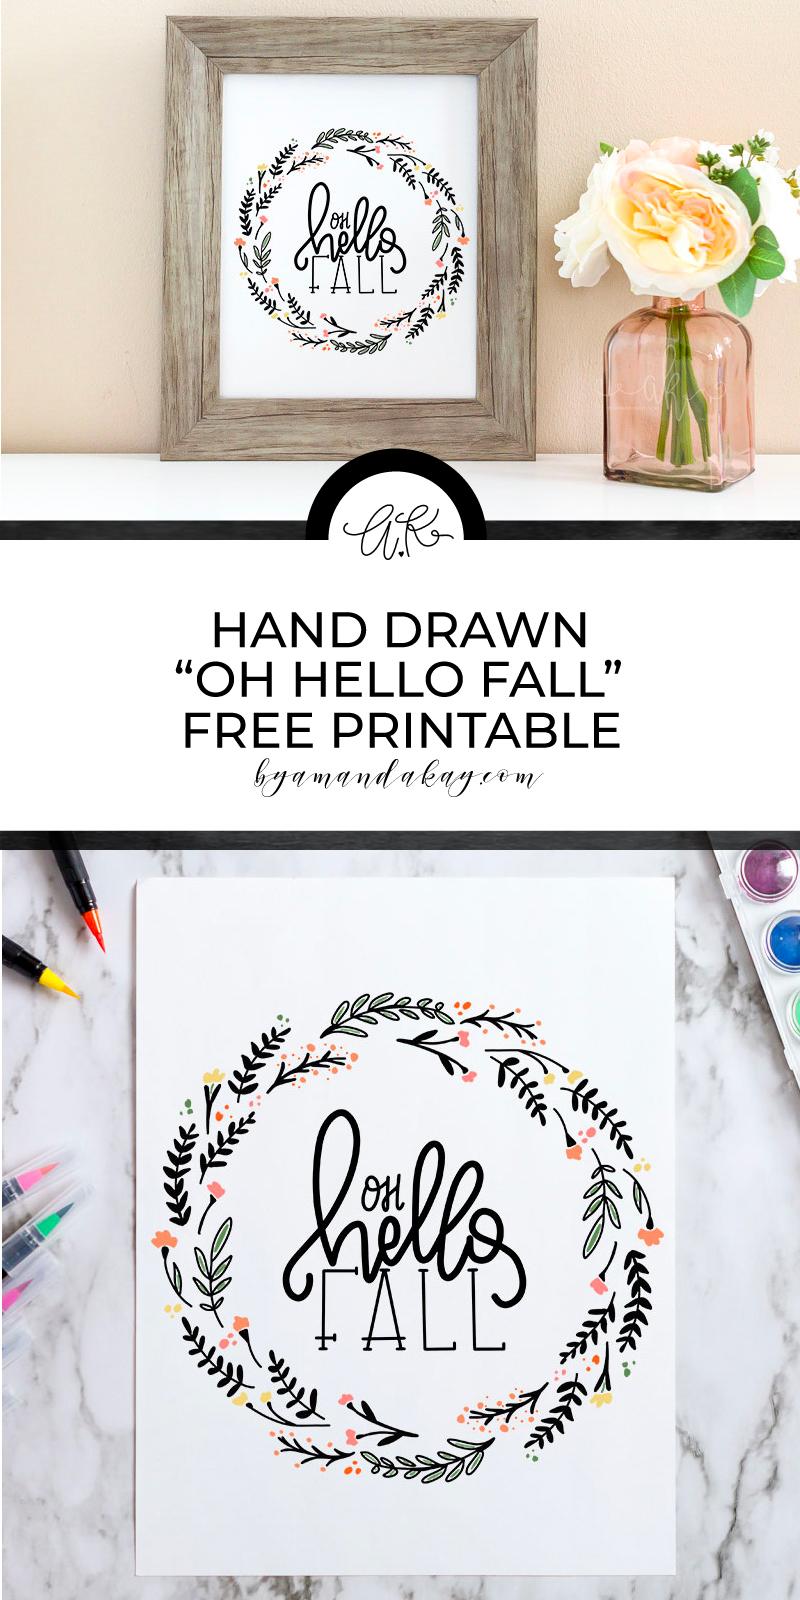 Hand drawn fall inspired printable